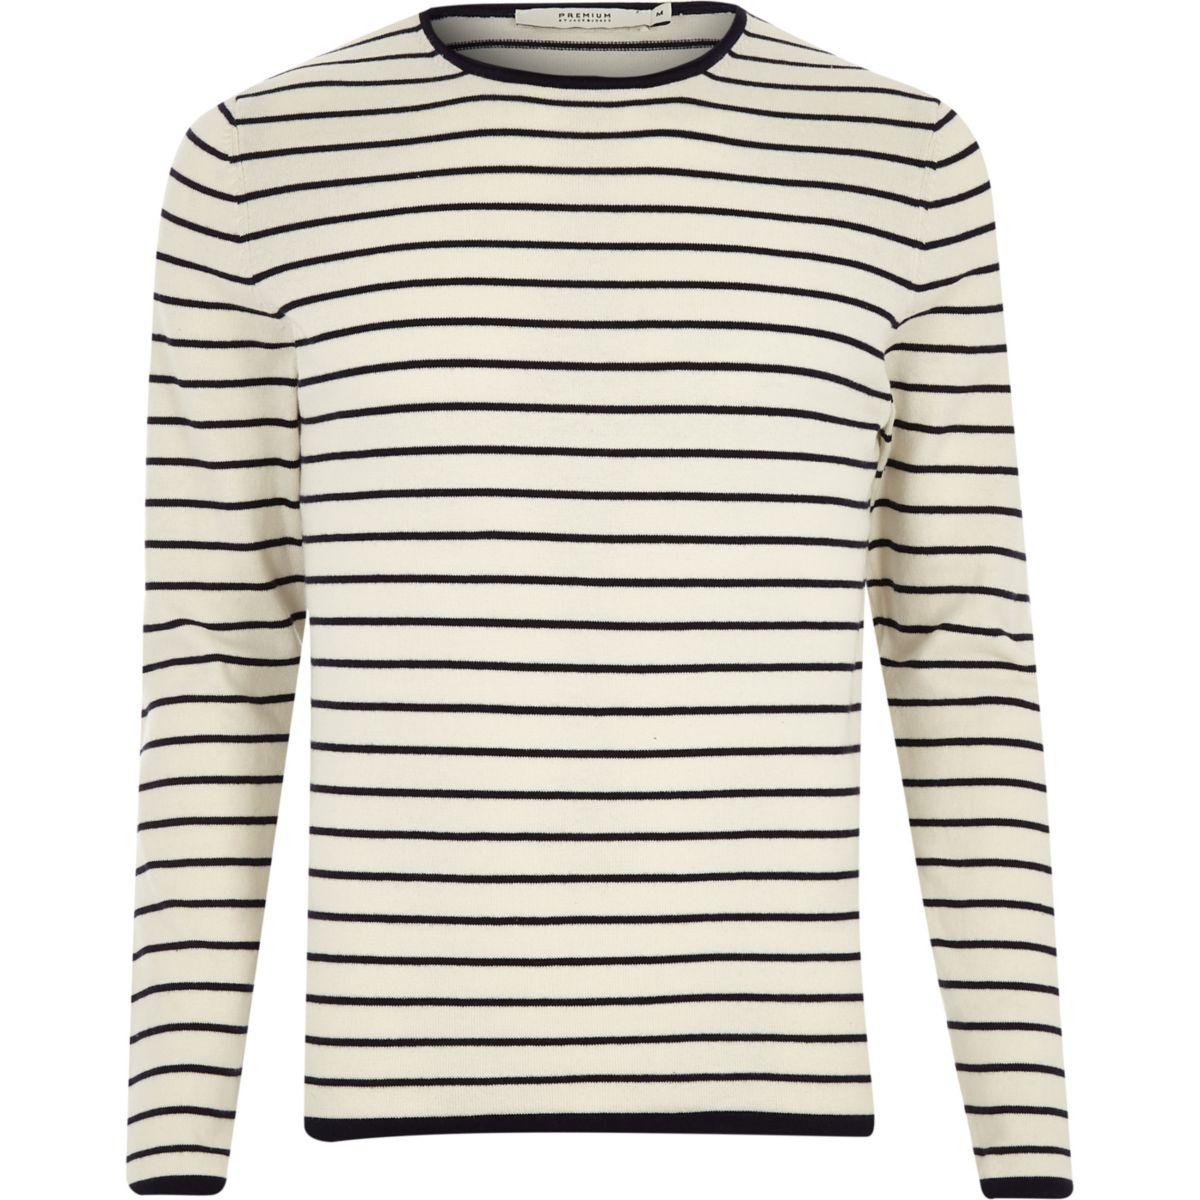 Jack & Jones grey knit stripe jumper